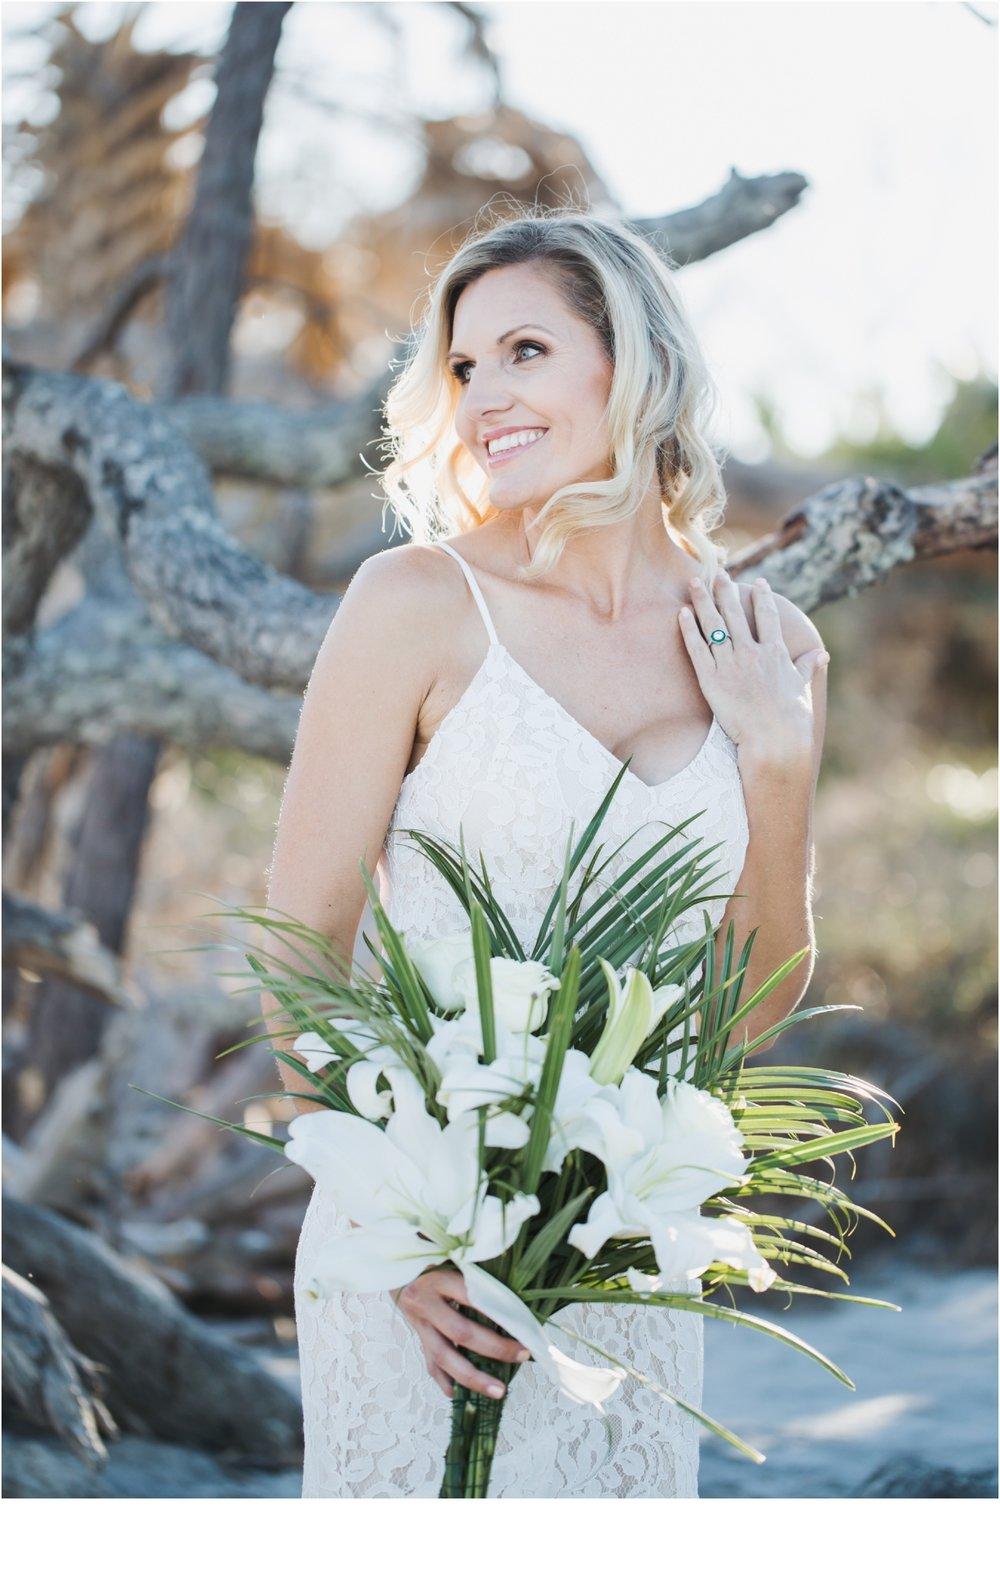 Rainey_Gregg_Photography_St._Simons_Island_Georgia_California_Wedding_Portrait_Photography_1567.jpg